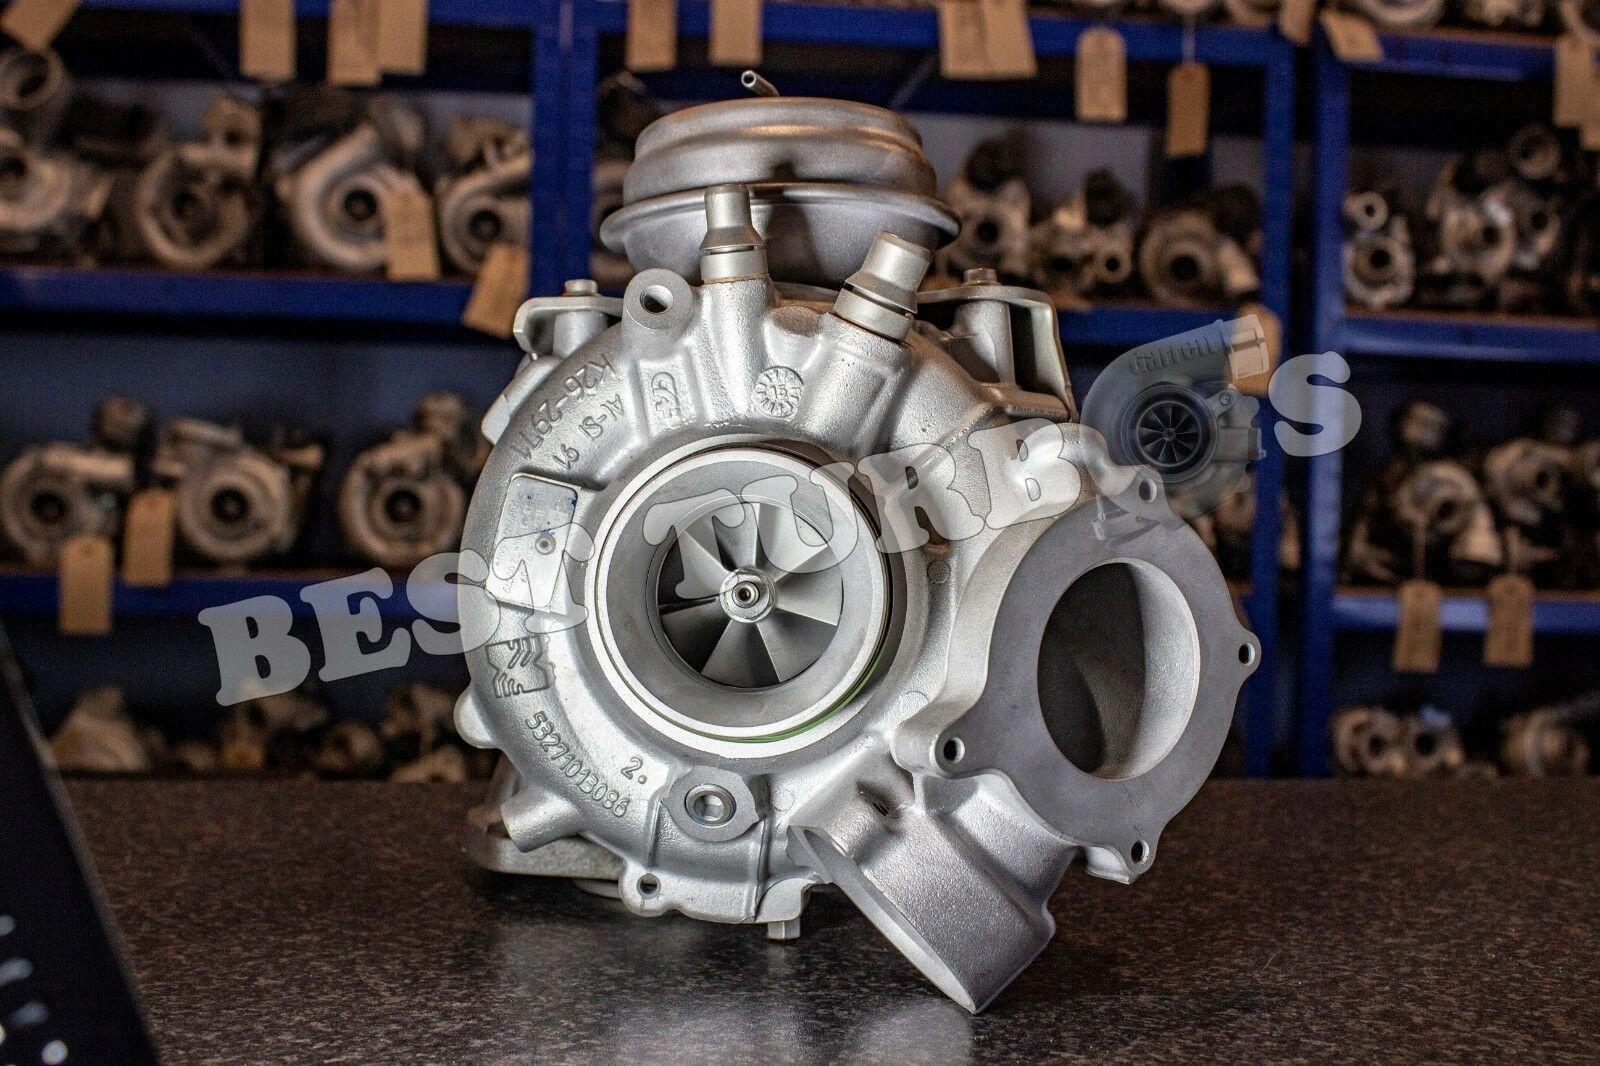 Turbocharger BMW X6 X5 X4 X3 740D 640D 535D 435D 335D xDrive 313hp  53269700014